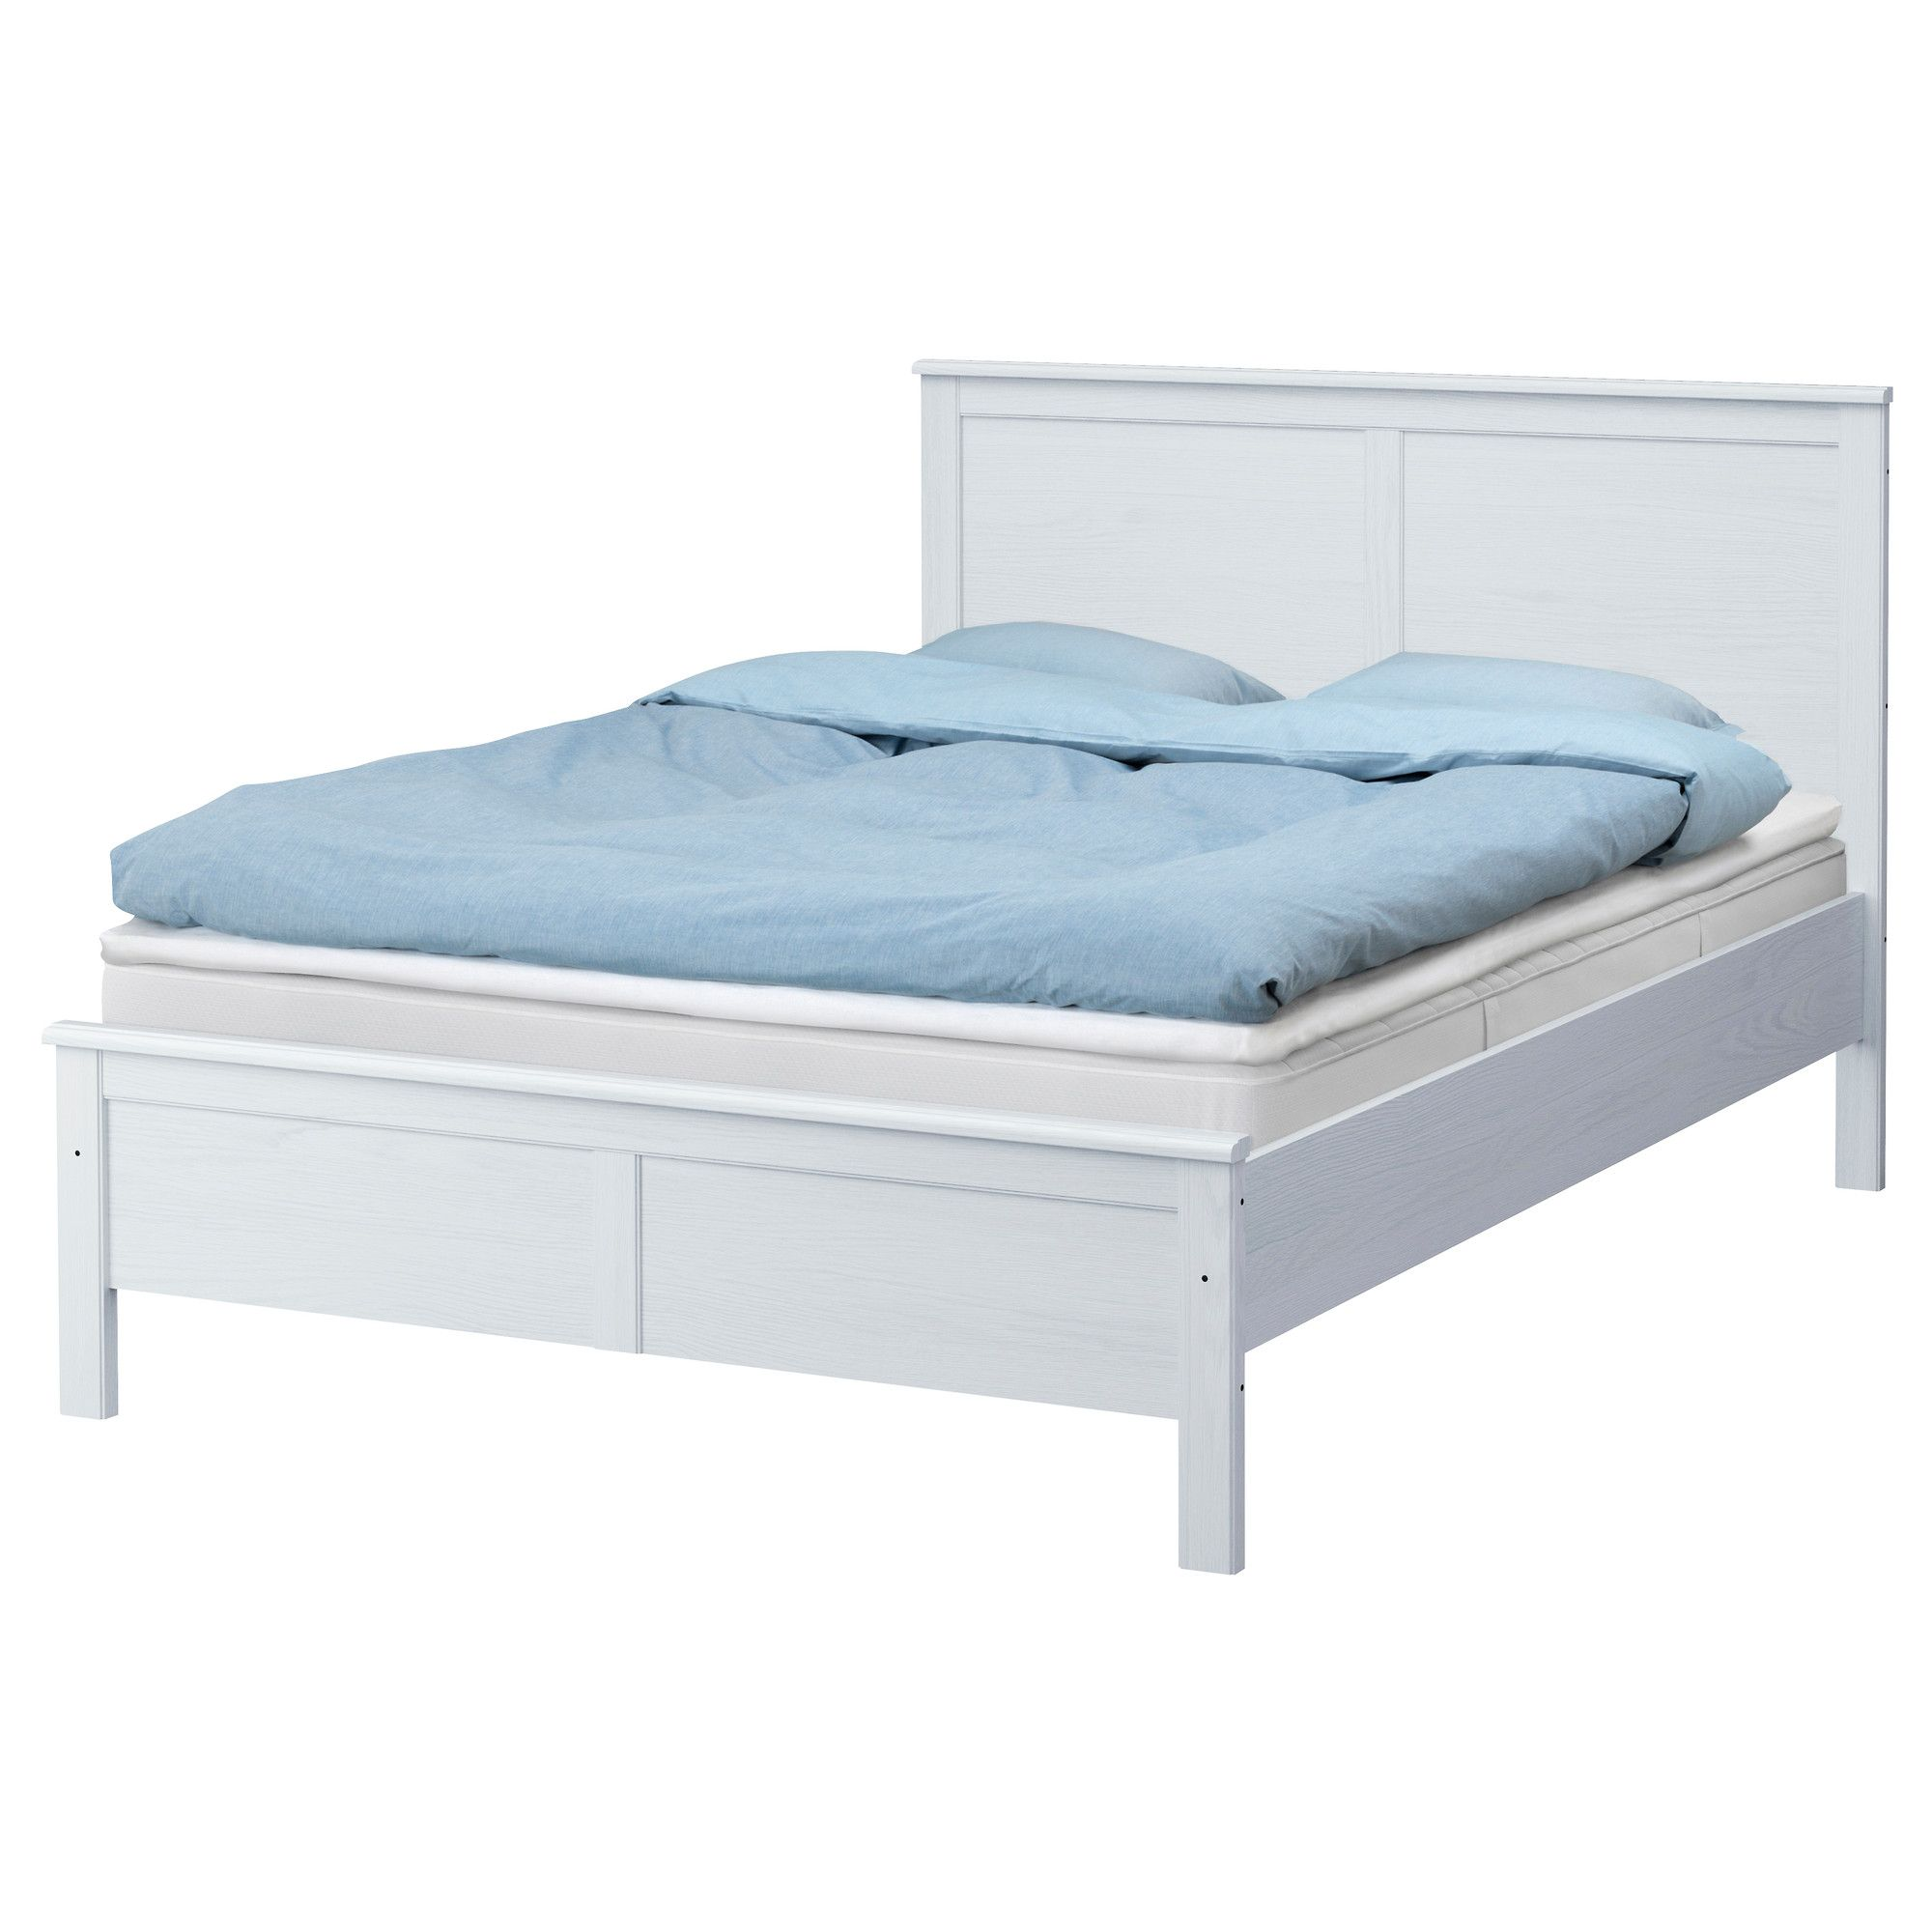 ASPELUND Bed frame - Queen - IKEA | Interiors | Pinterest ...